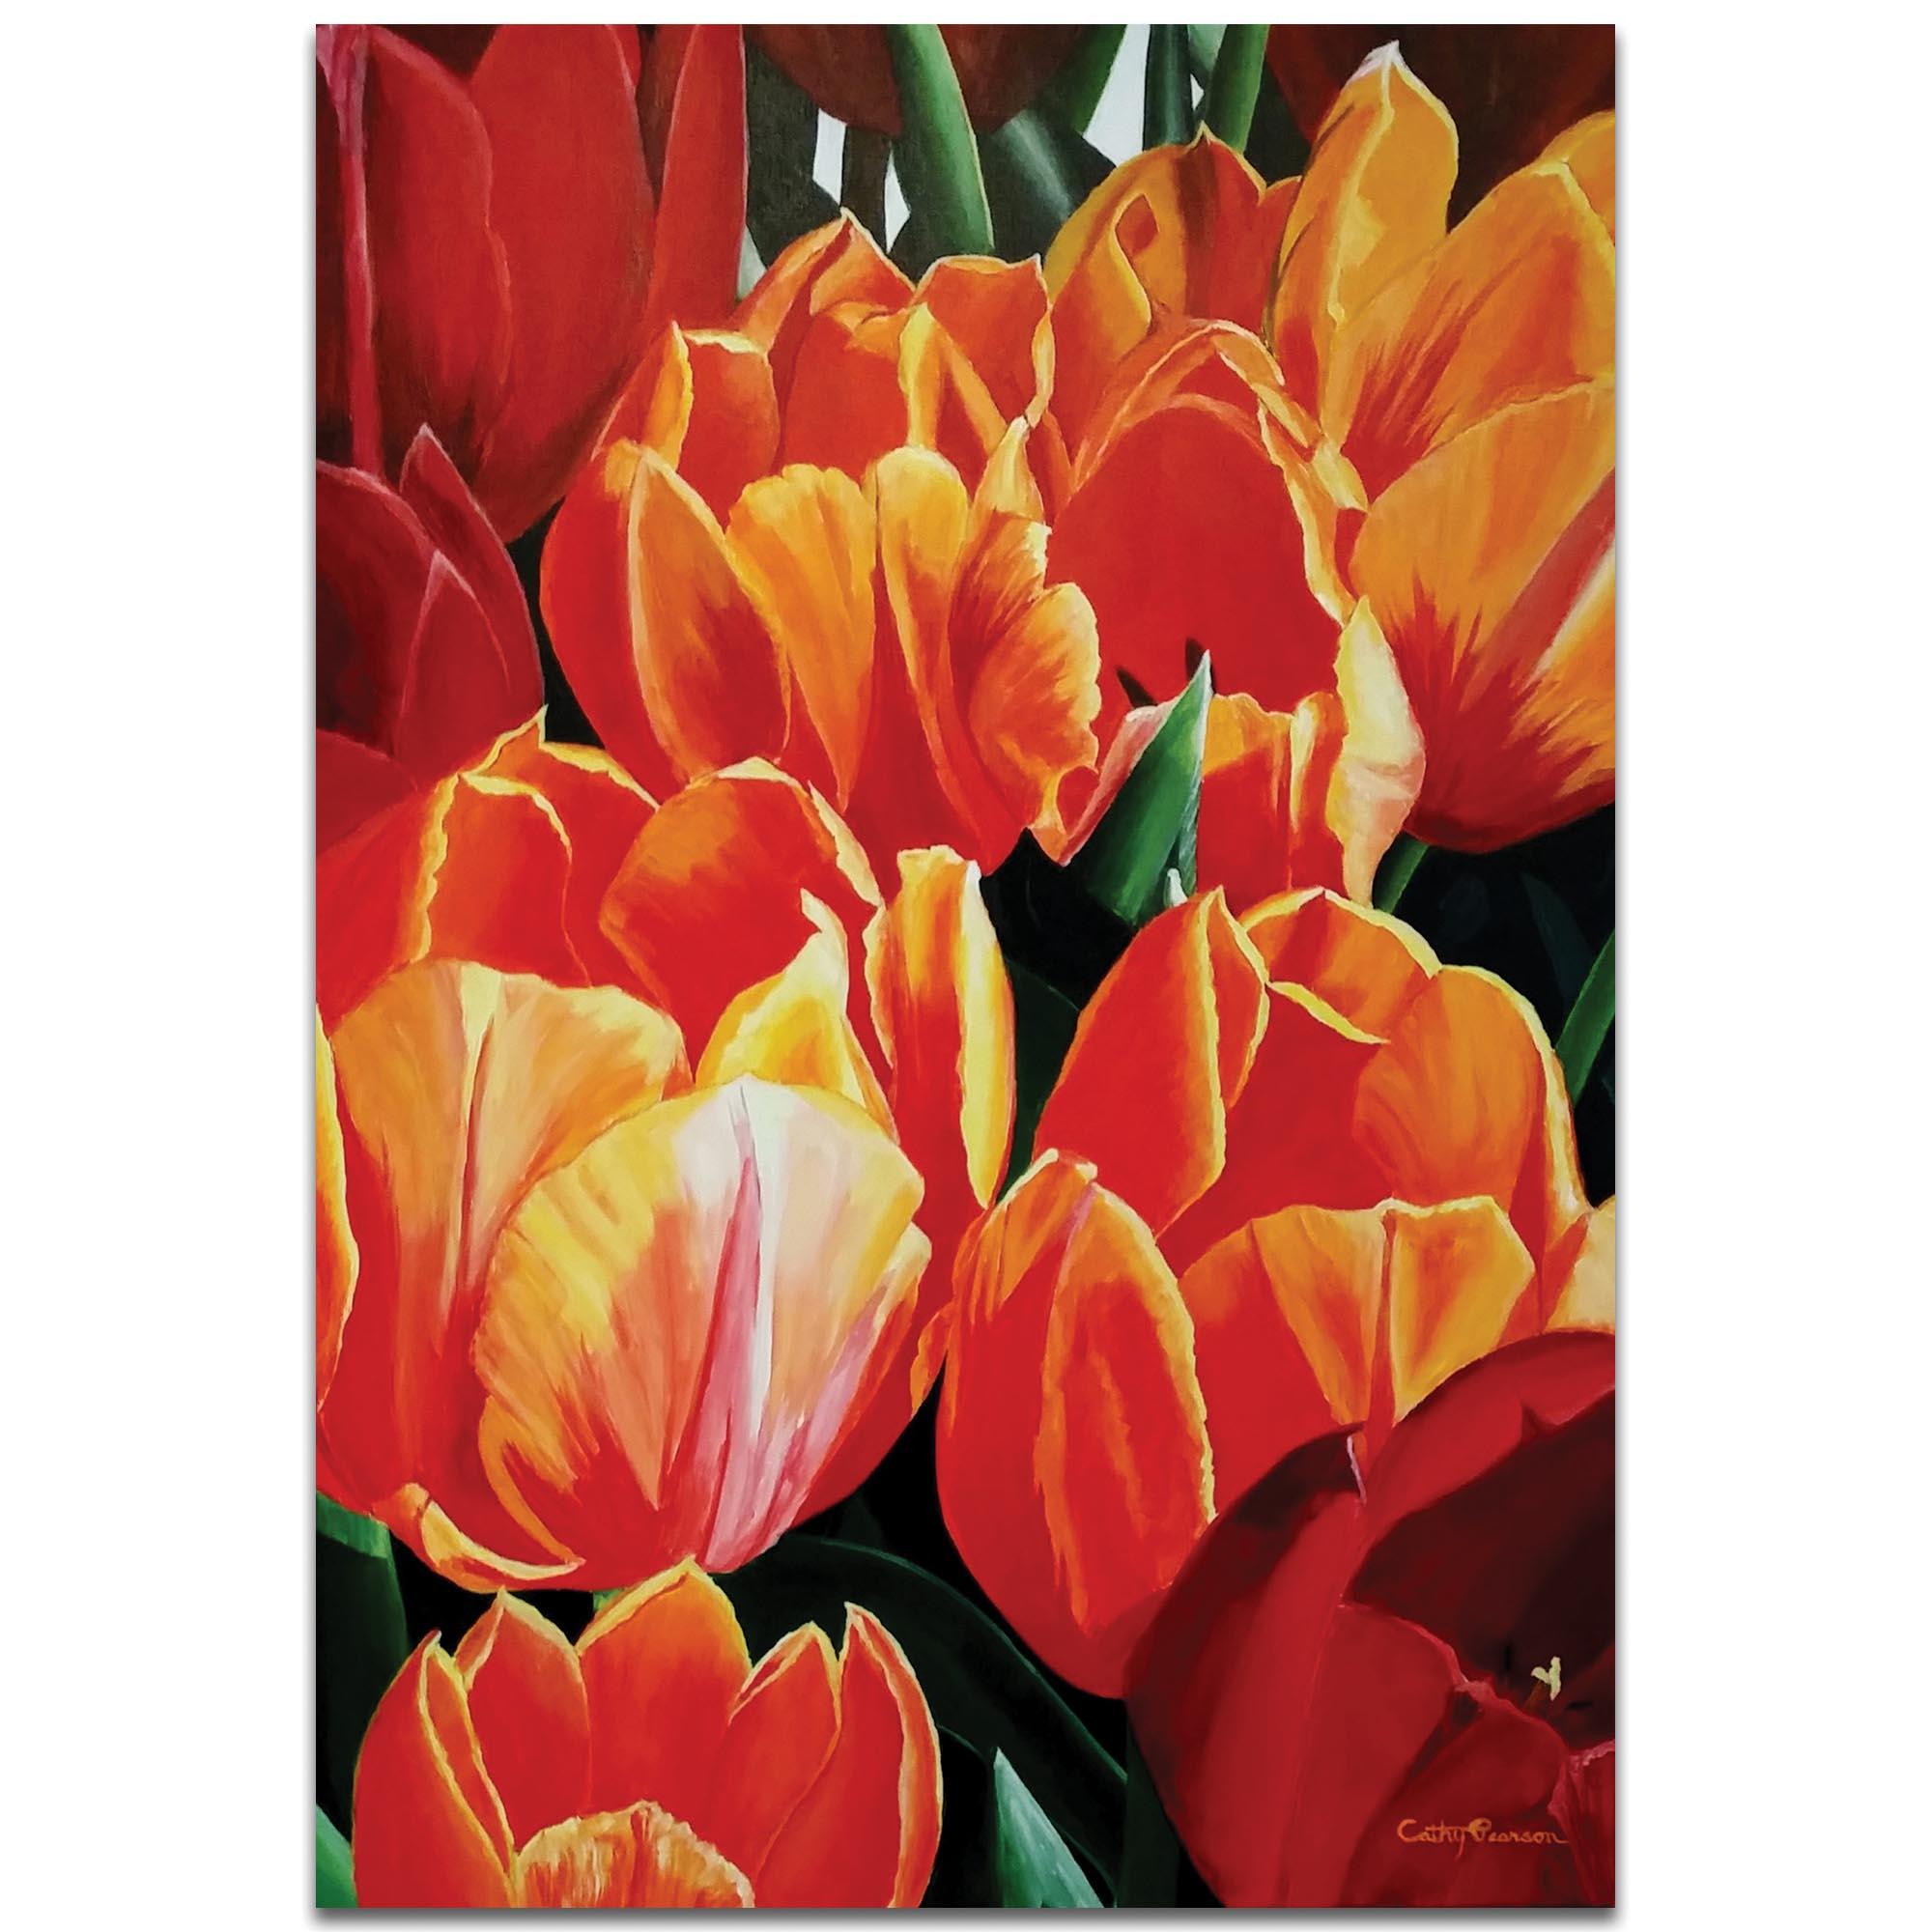 Traditional Wall Art 'Tulip Bonanza' - Floral Decor on Metal or Plexiglass